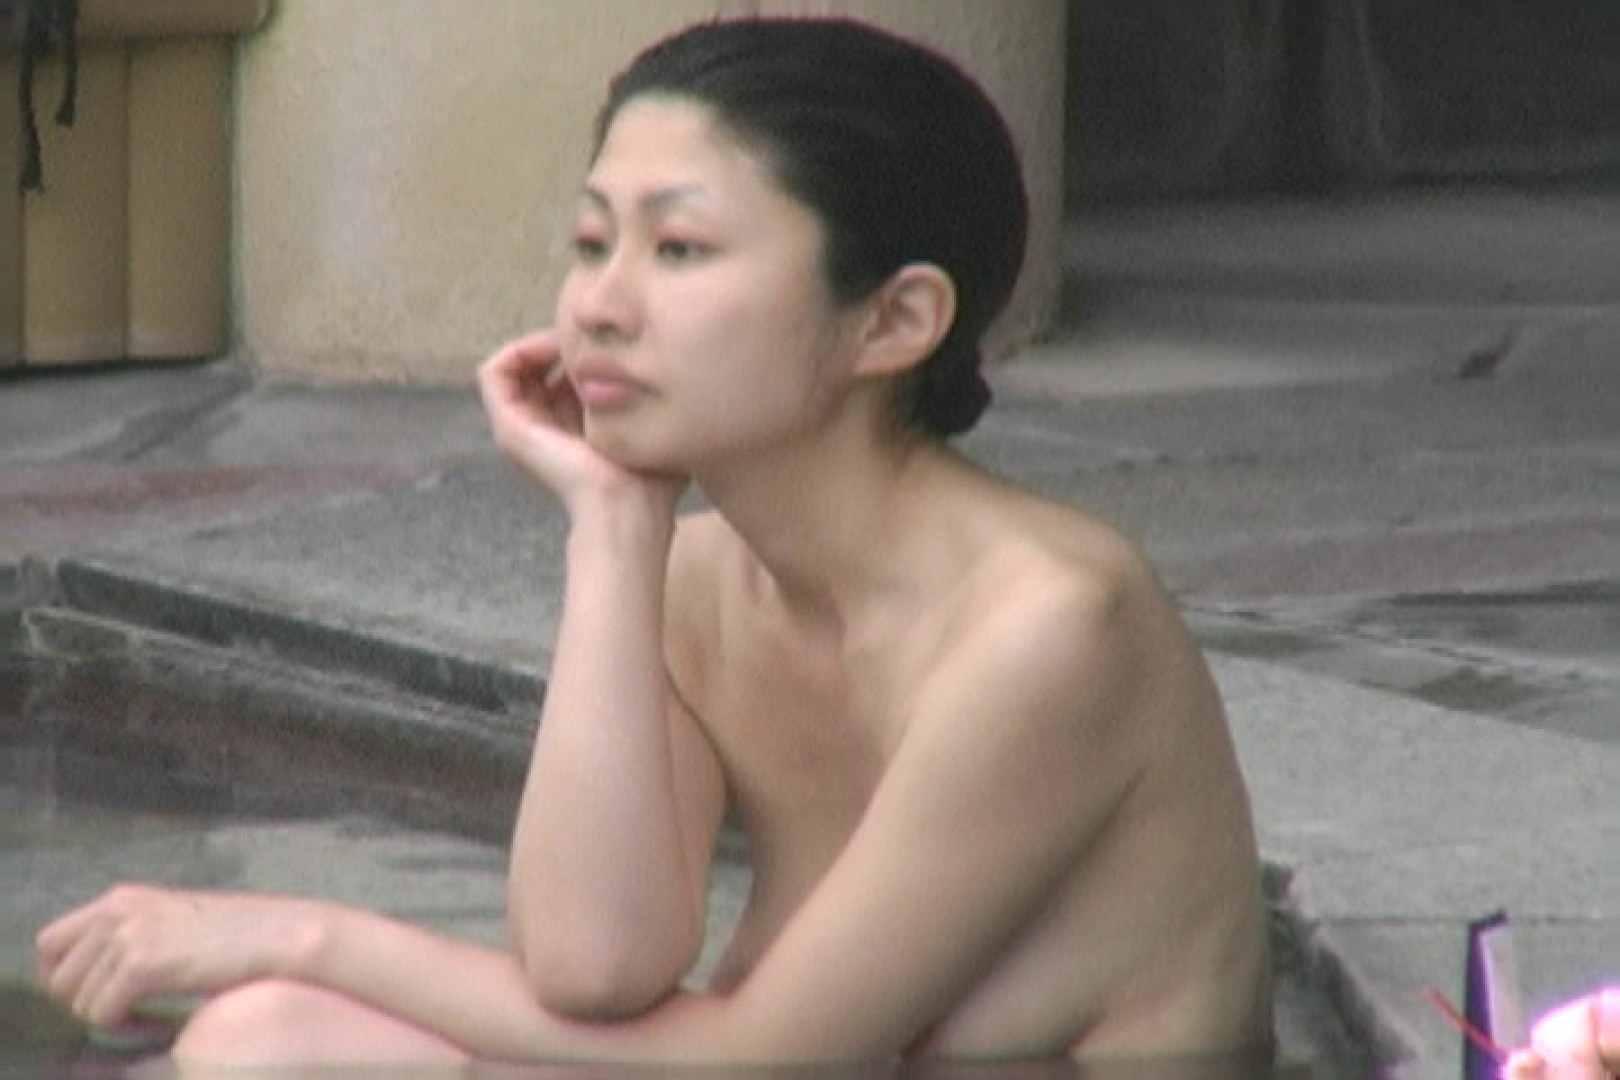 Aquaな露天風呂Vol.642 盗撮師作品 セックス画像 86pic 41